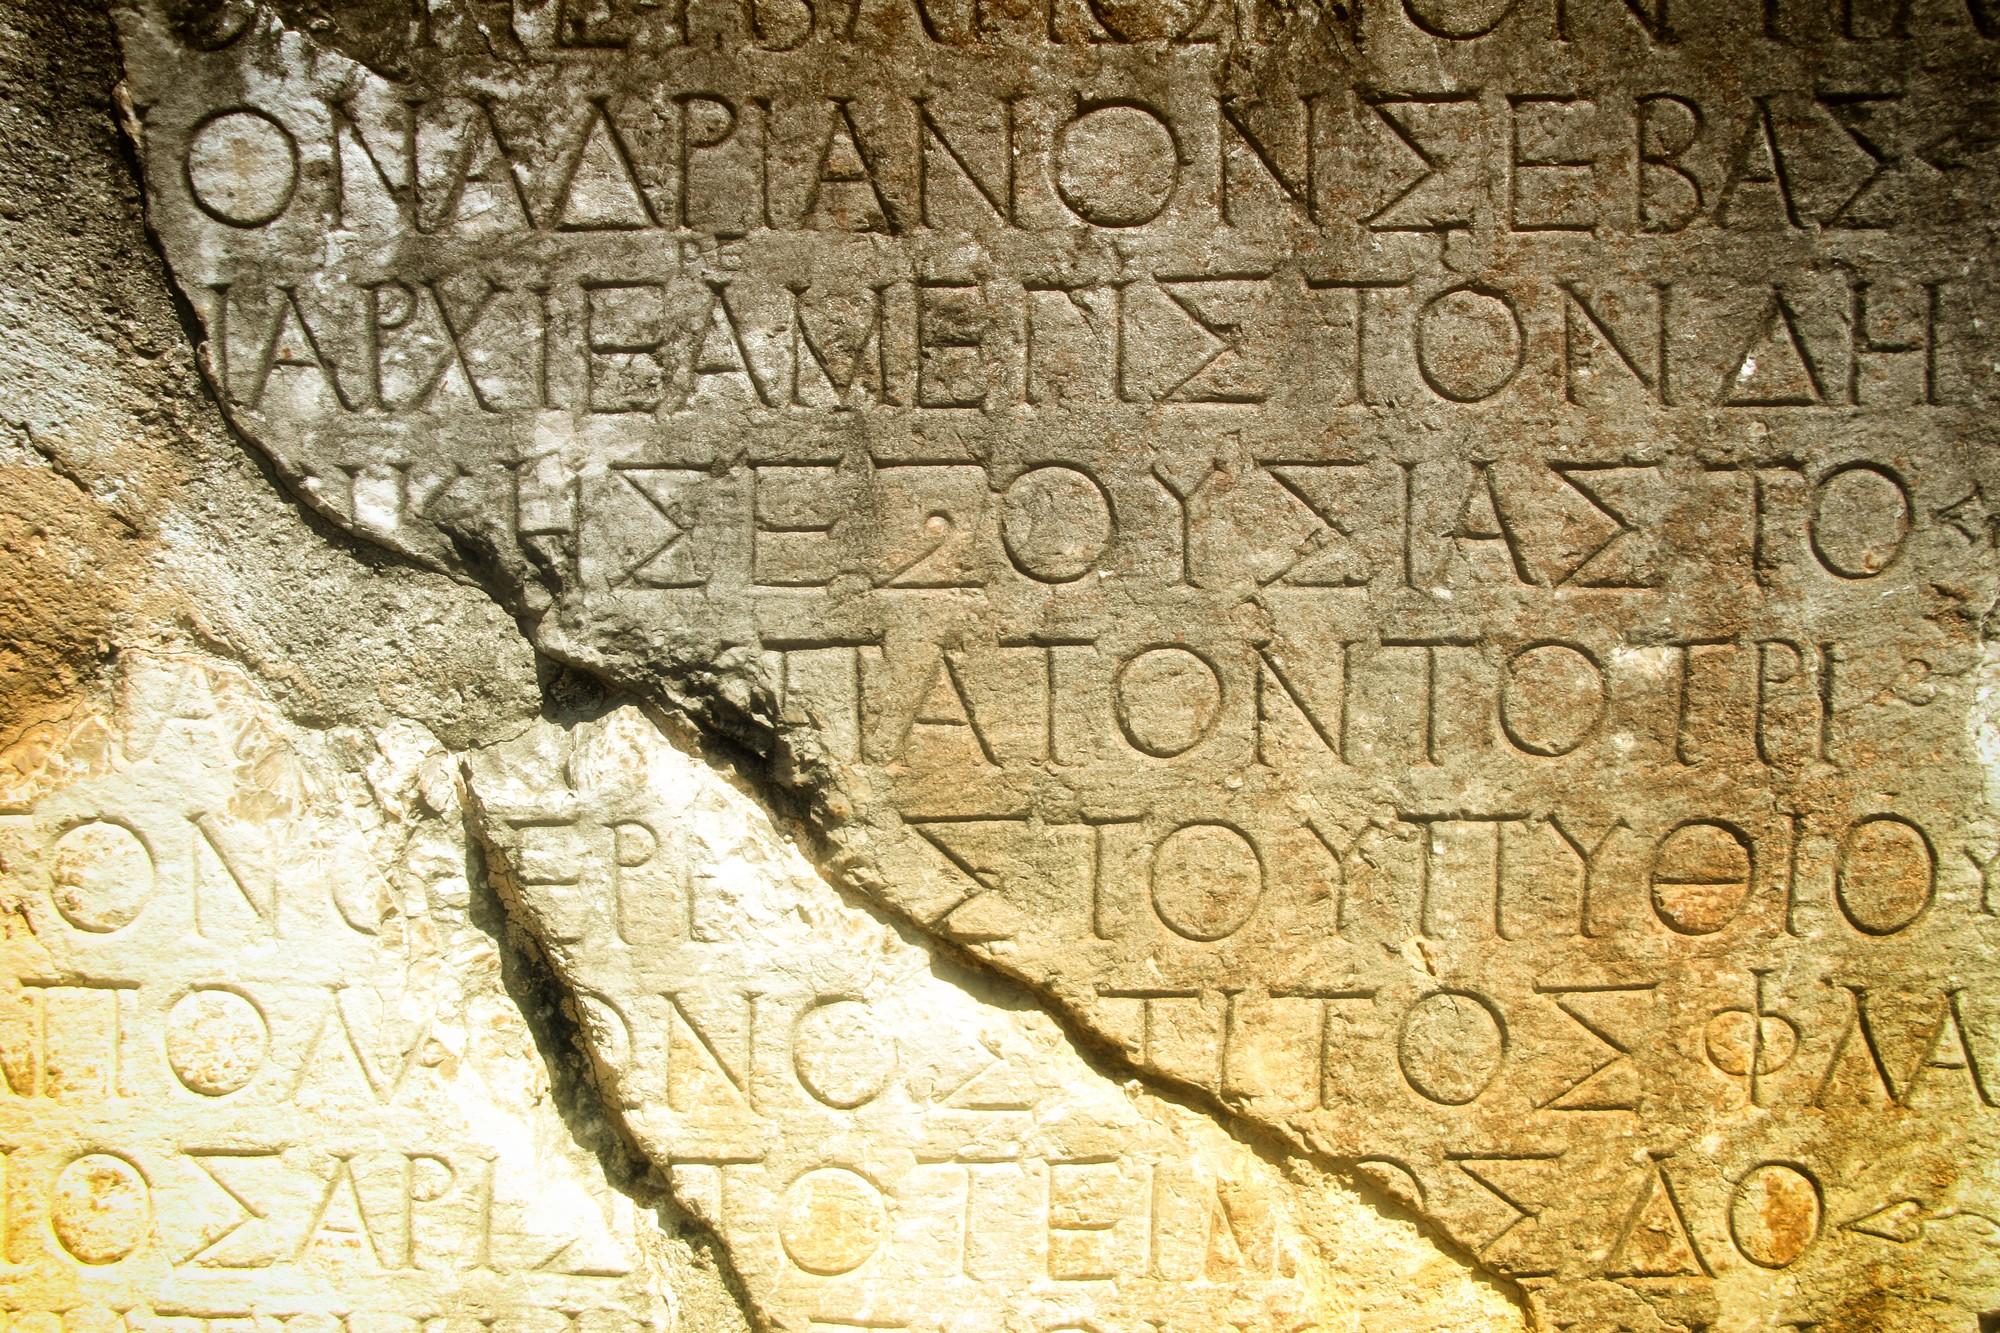 Priscilla & Aquila (Acts 18) Make - Jesus Without Language Pictures of roman language